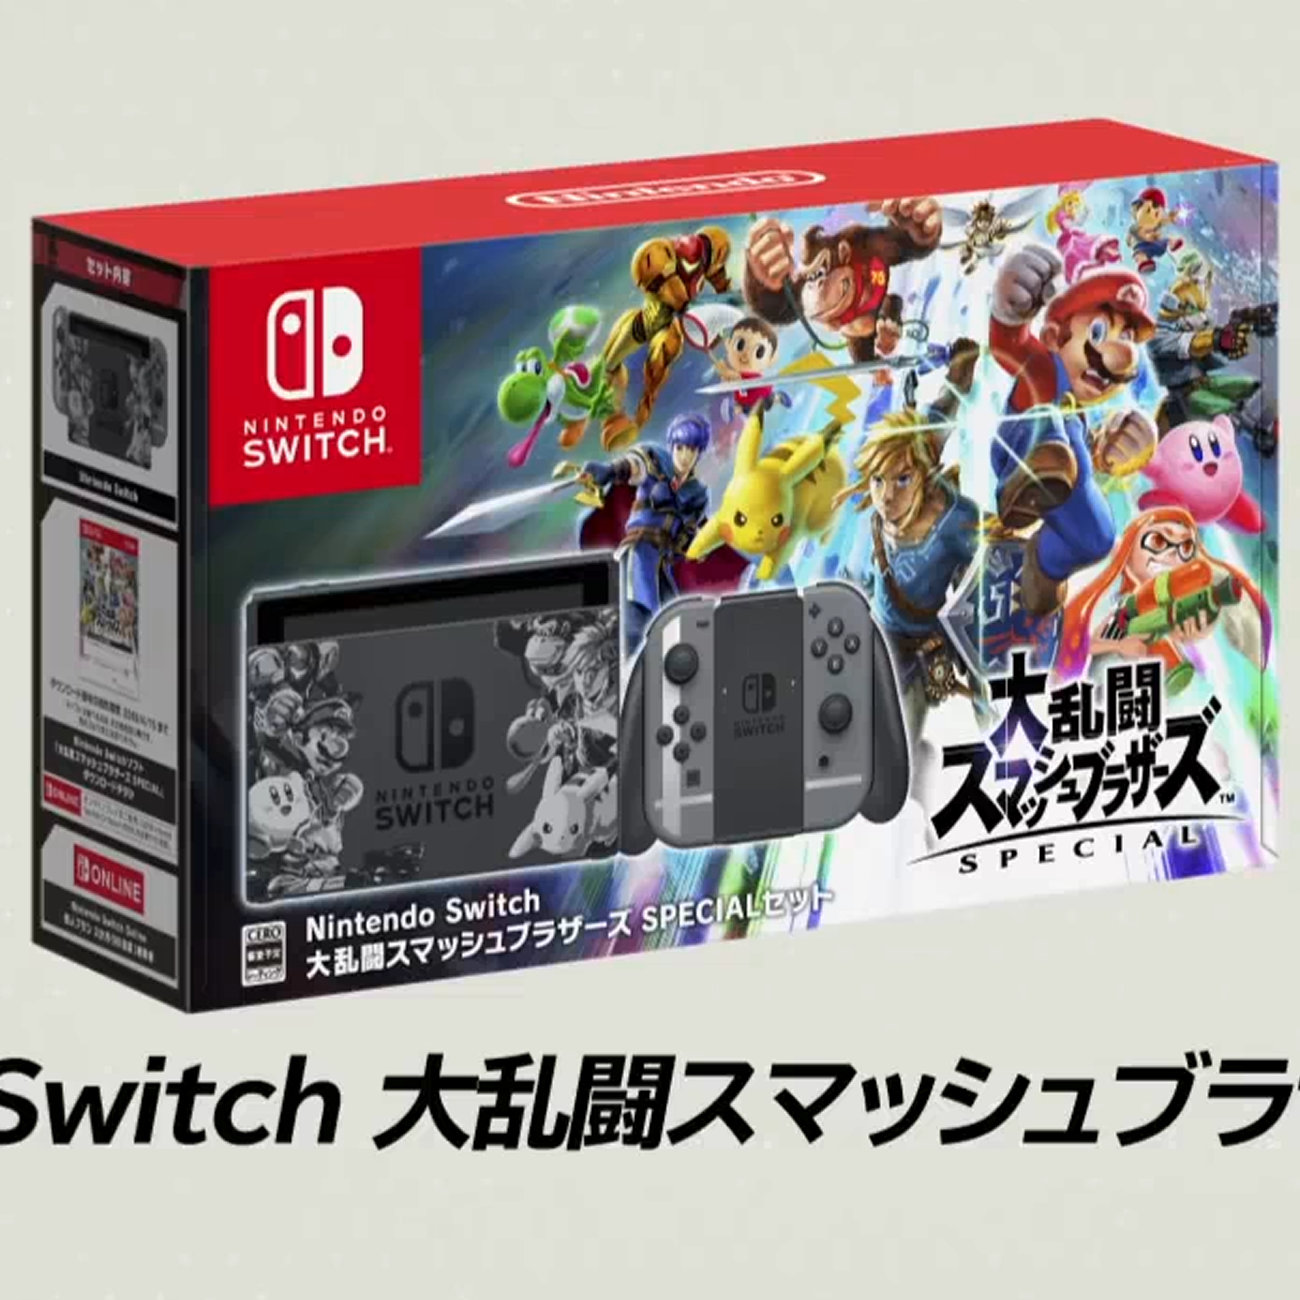 Nintendo Switch 大乱闘スマッシュブラザーズ SPECIALセット、予約